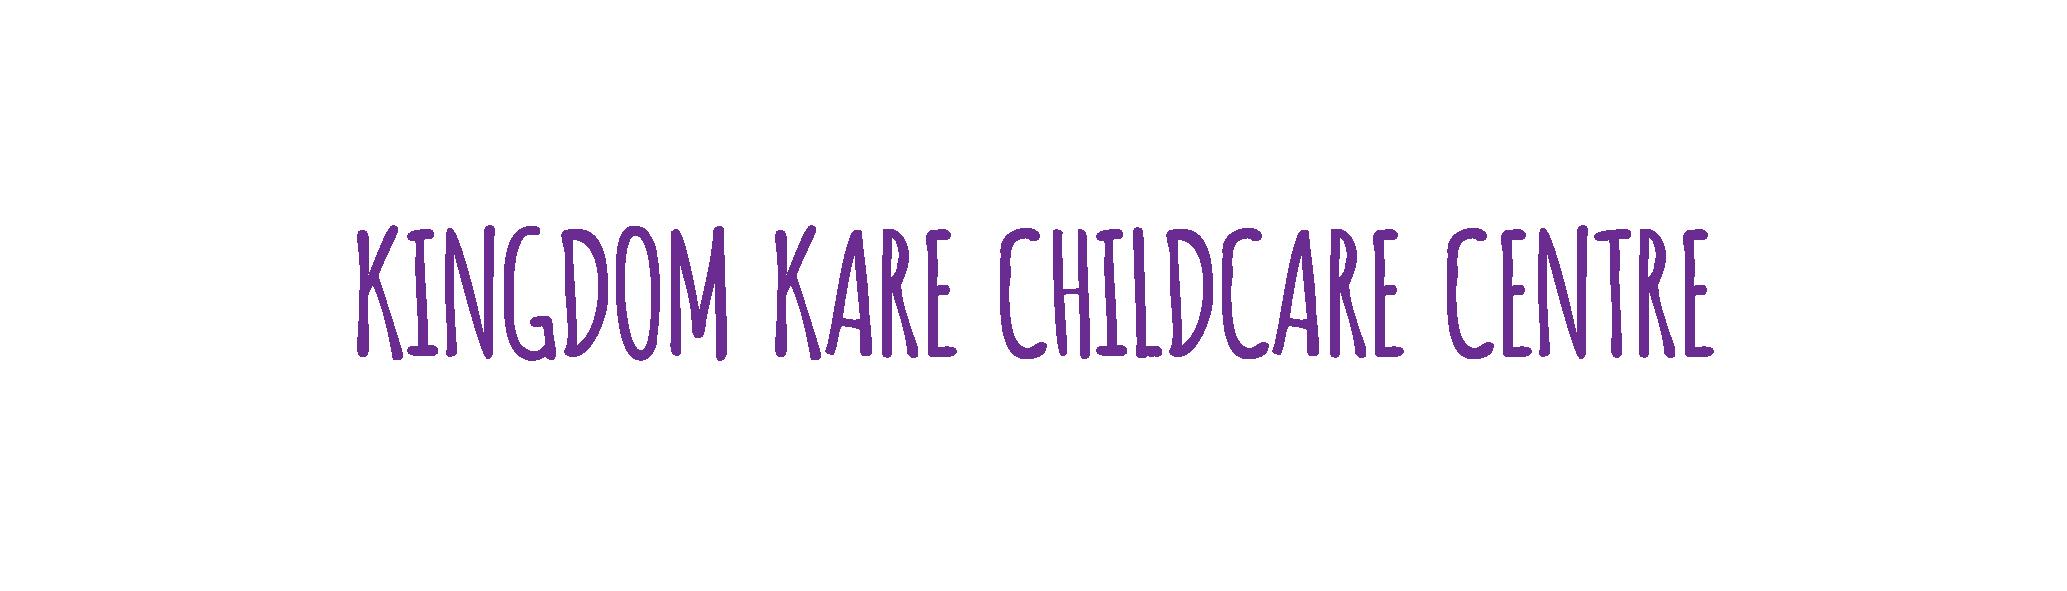 Kingdom-Kare-Childcare-Centre-Rotating-Header7.png